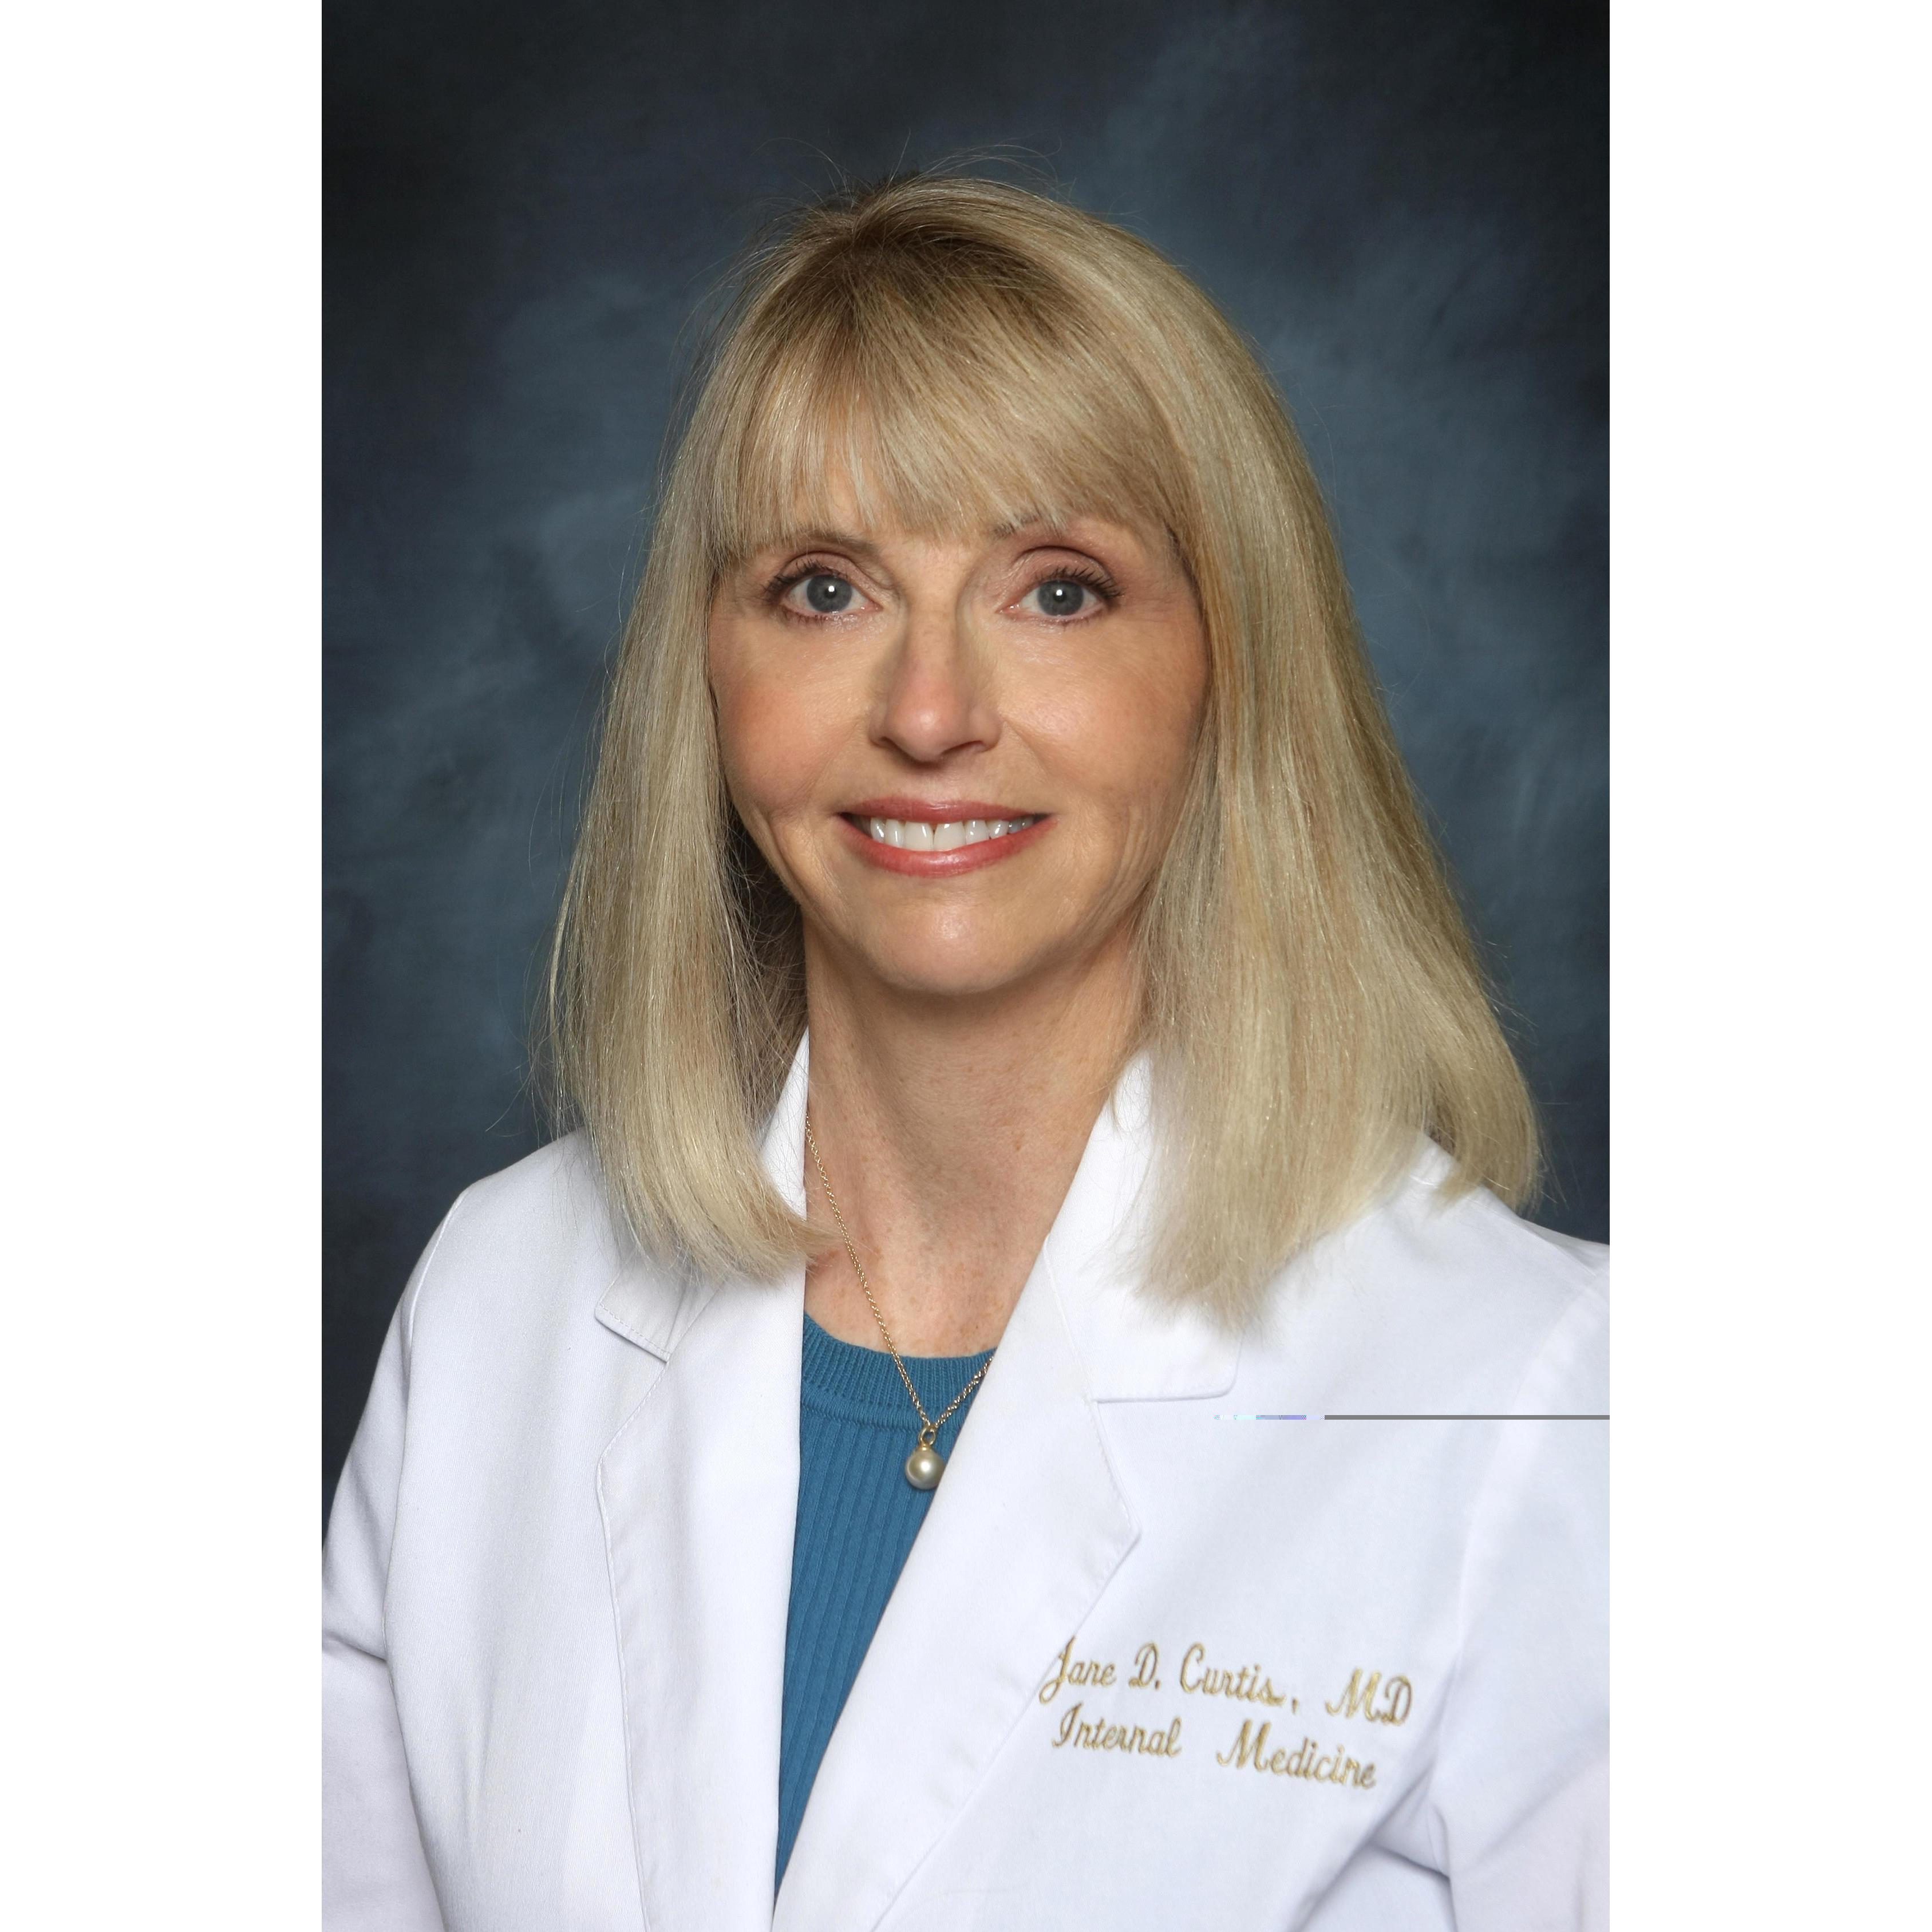 Jane Curtis, MD